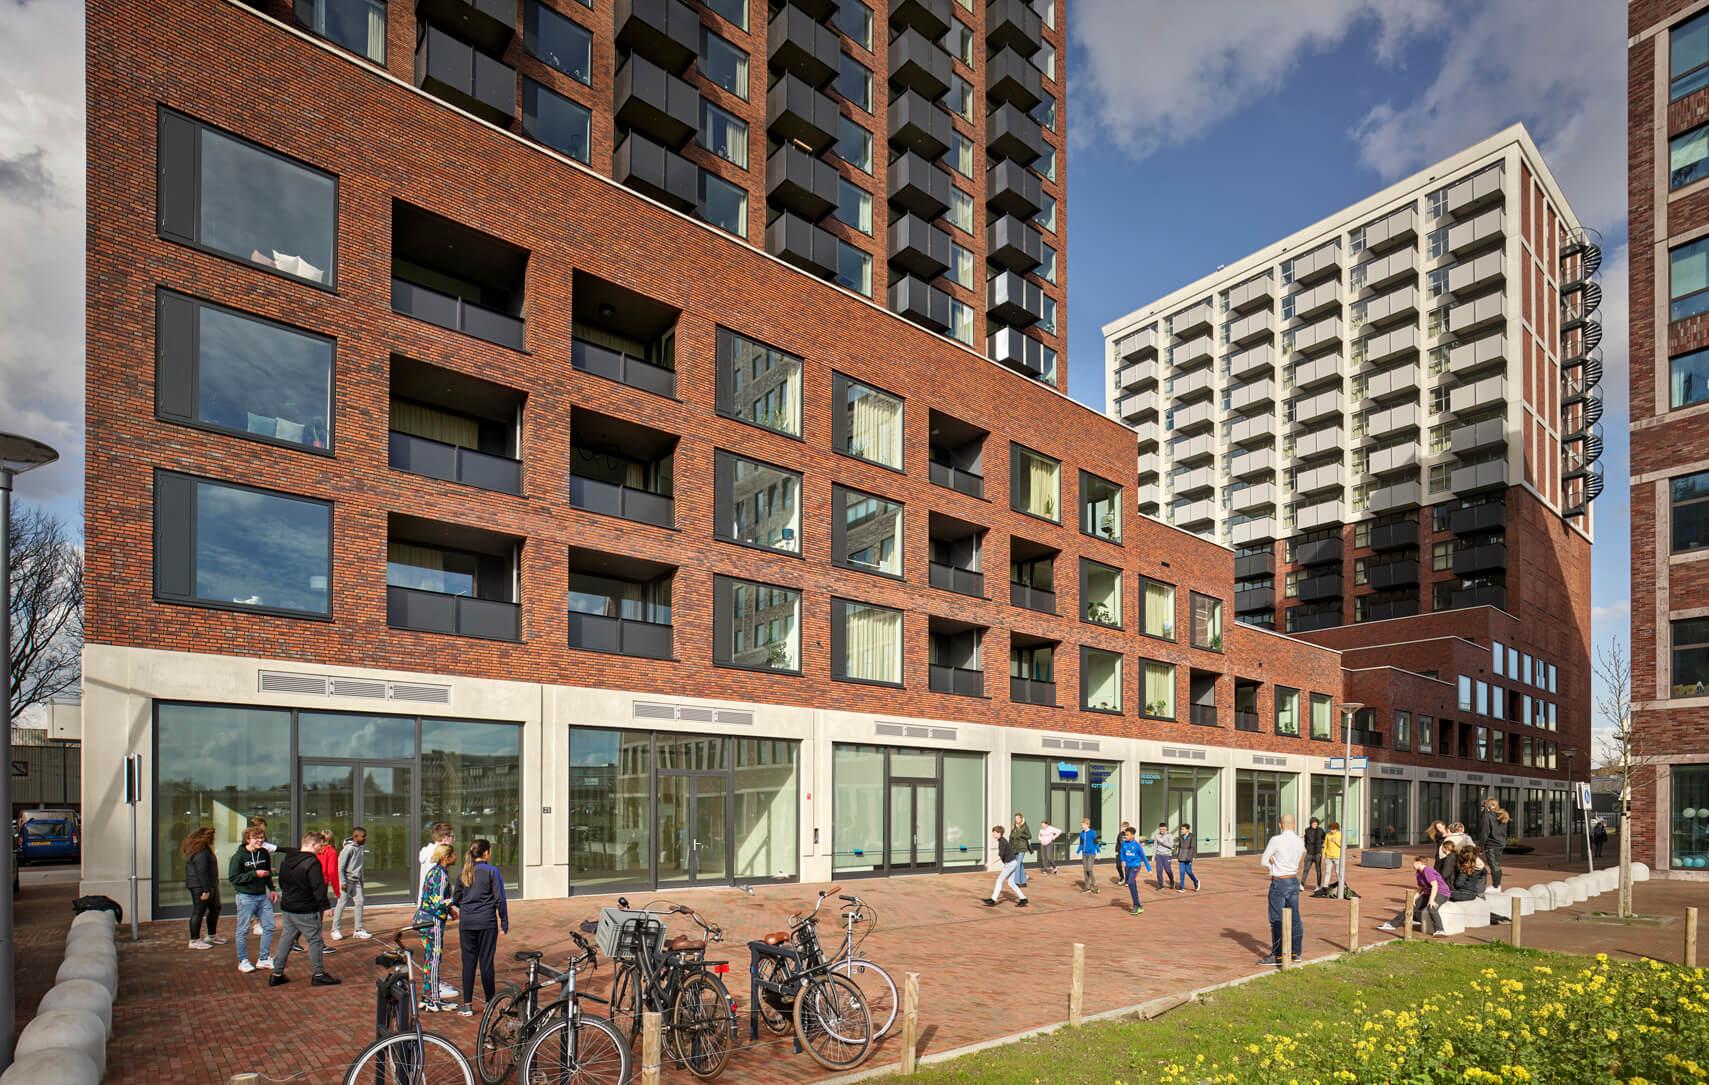 The Cohesion Cobana Rotterdam